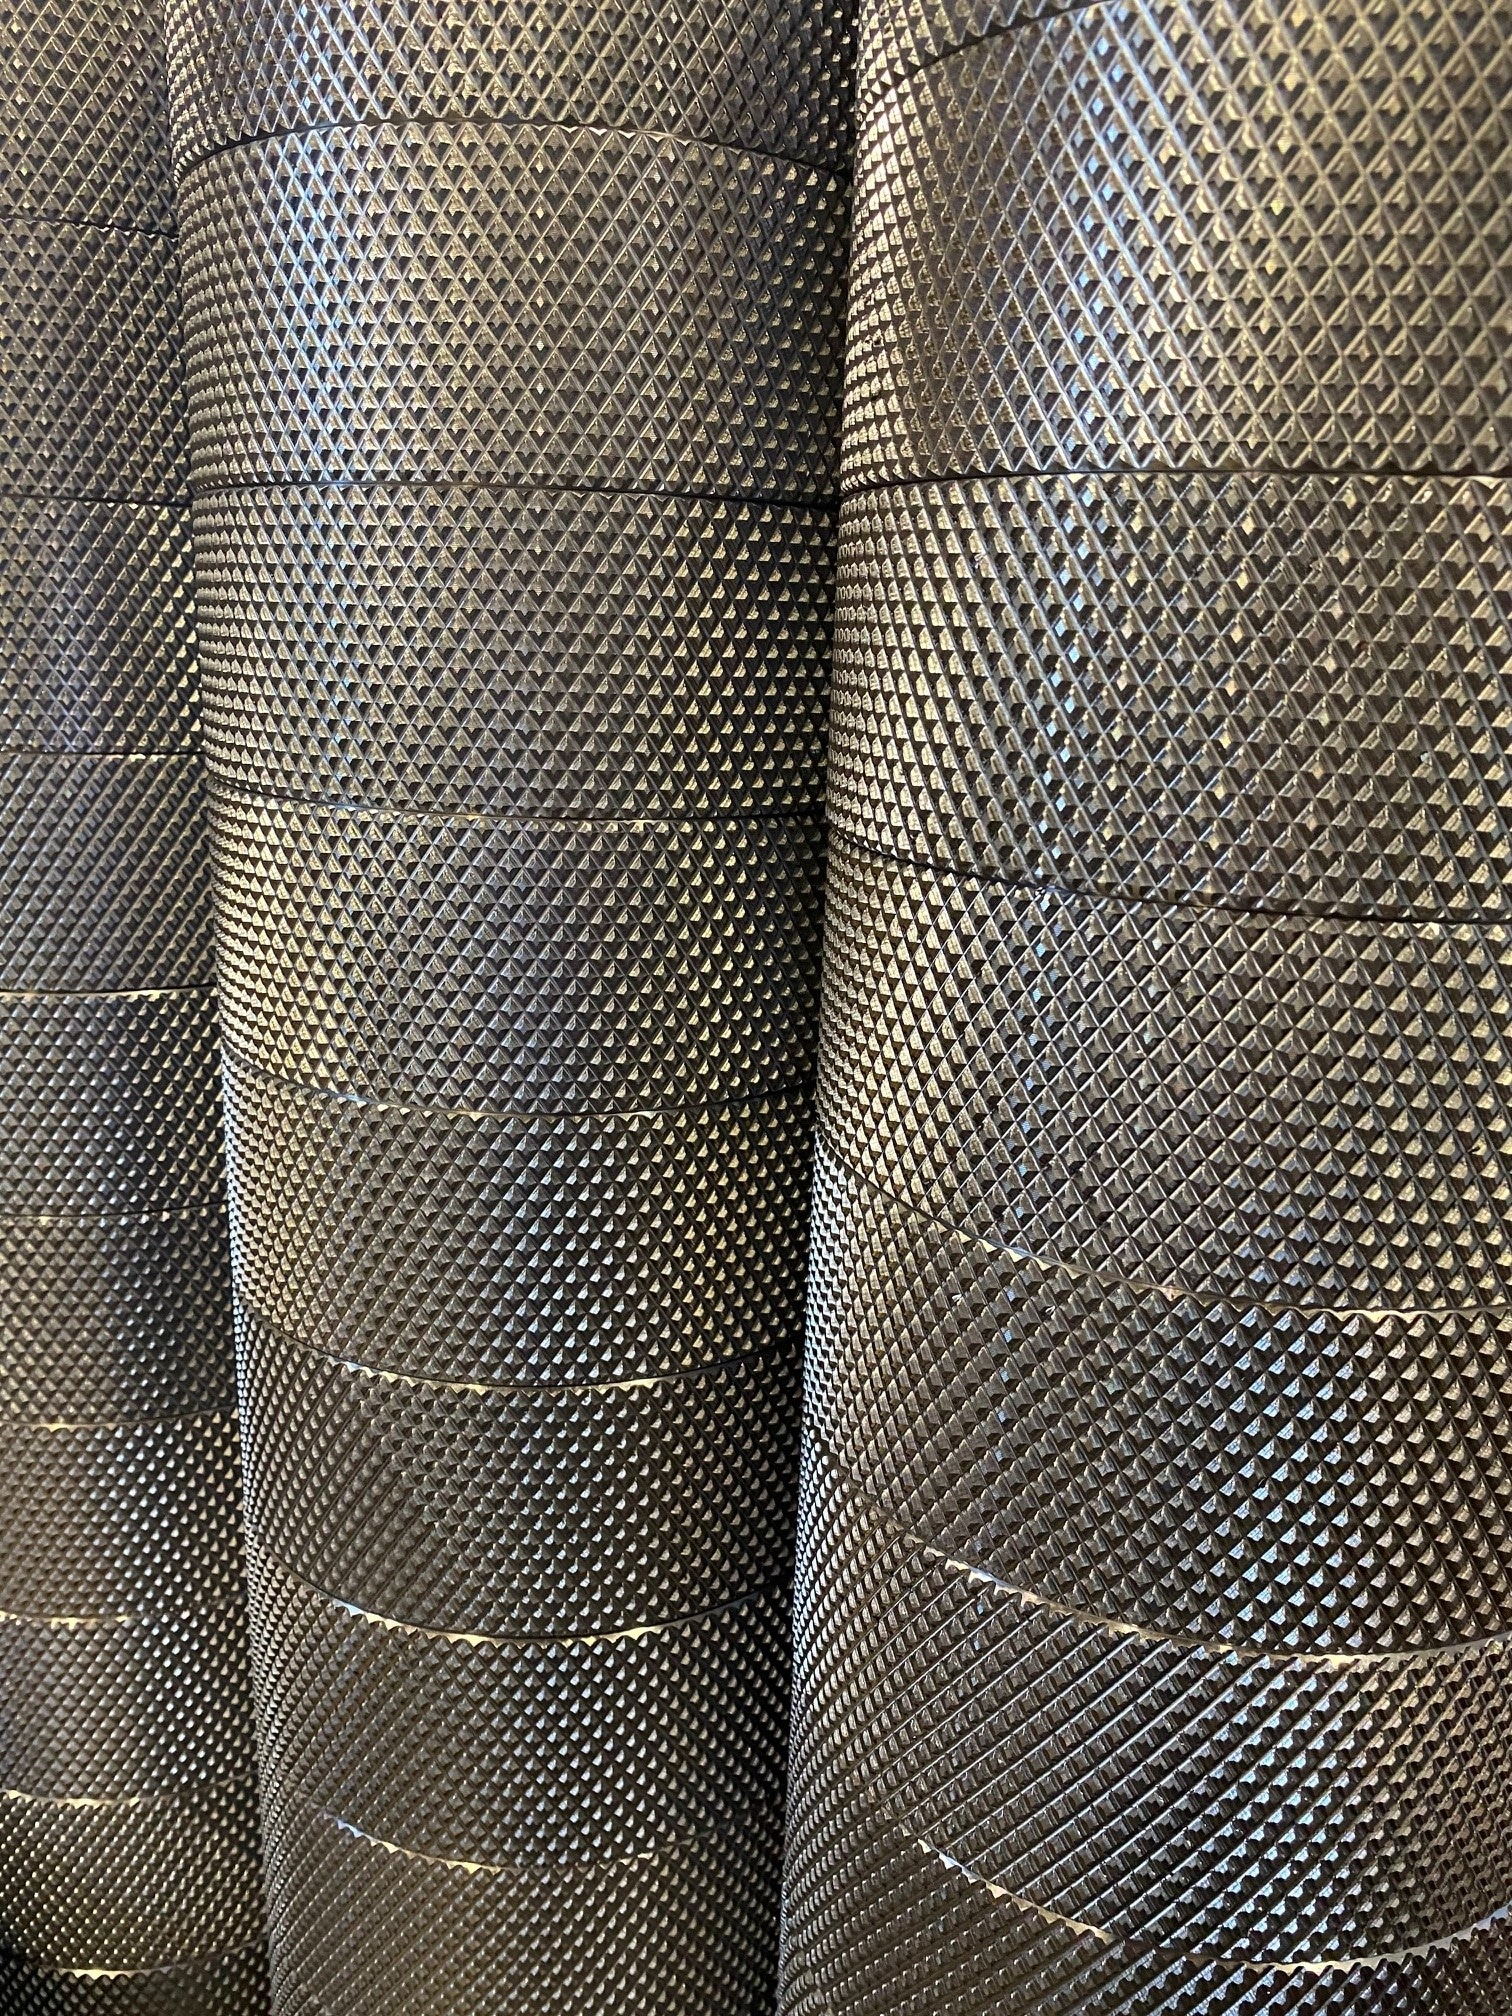 Rector knurled rolls